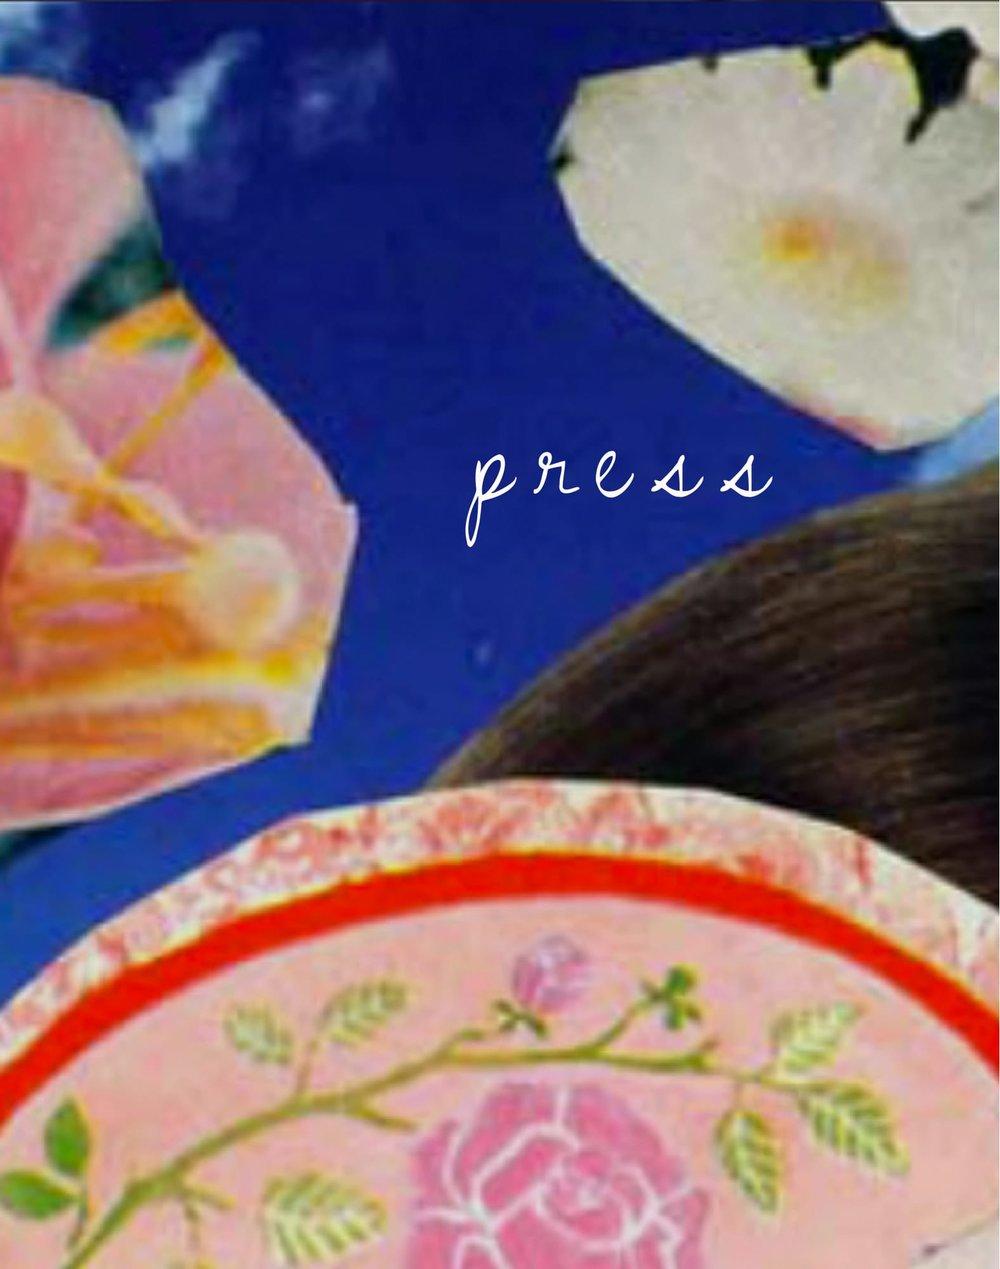 PRESS-LowRes-51.jpg